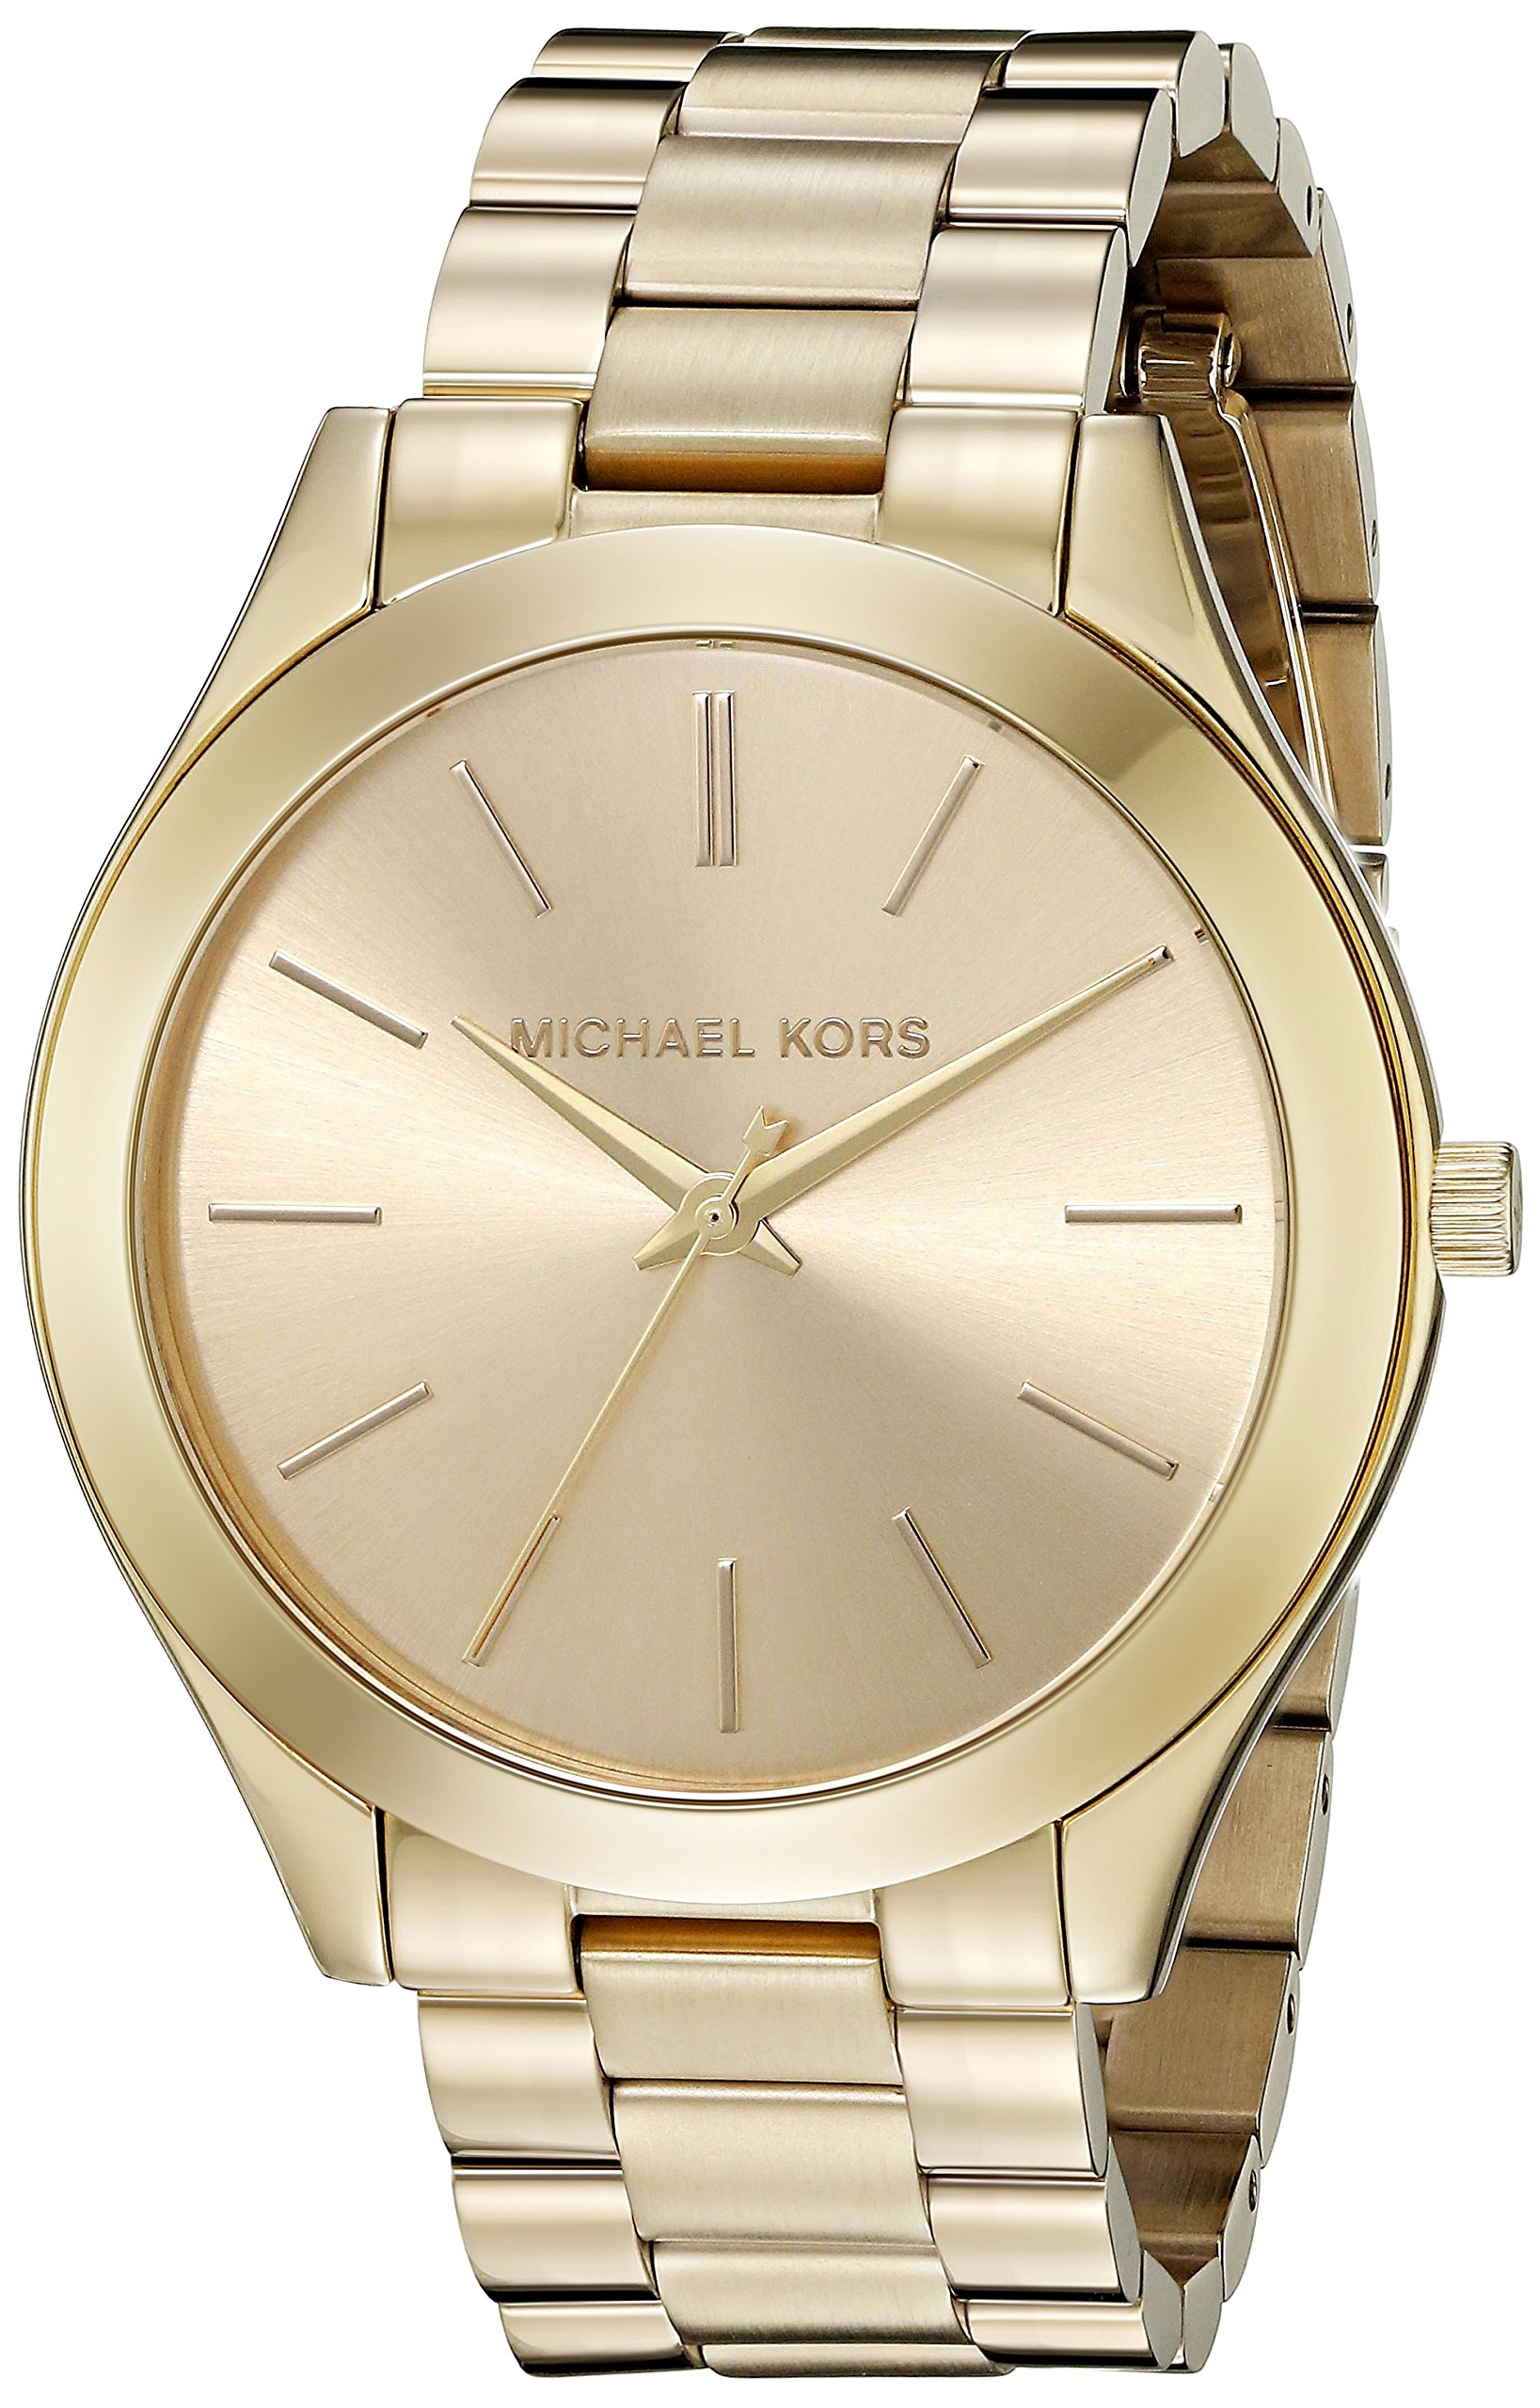 Michael Kors Watches Runway Watch (Gold)